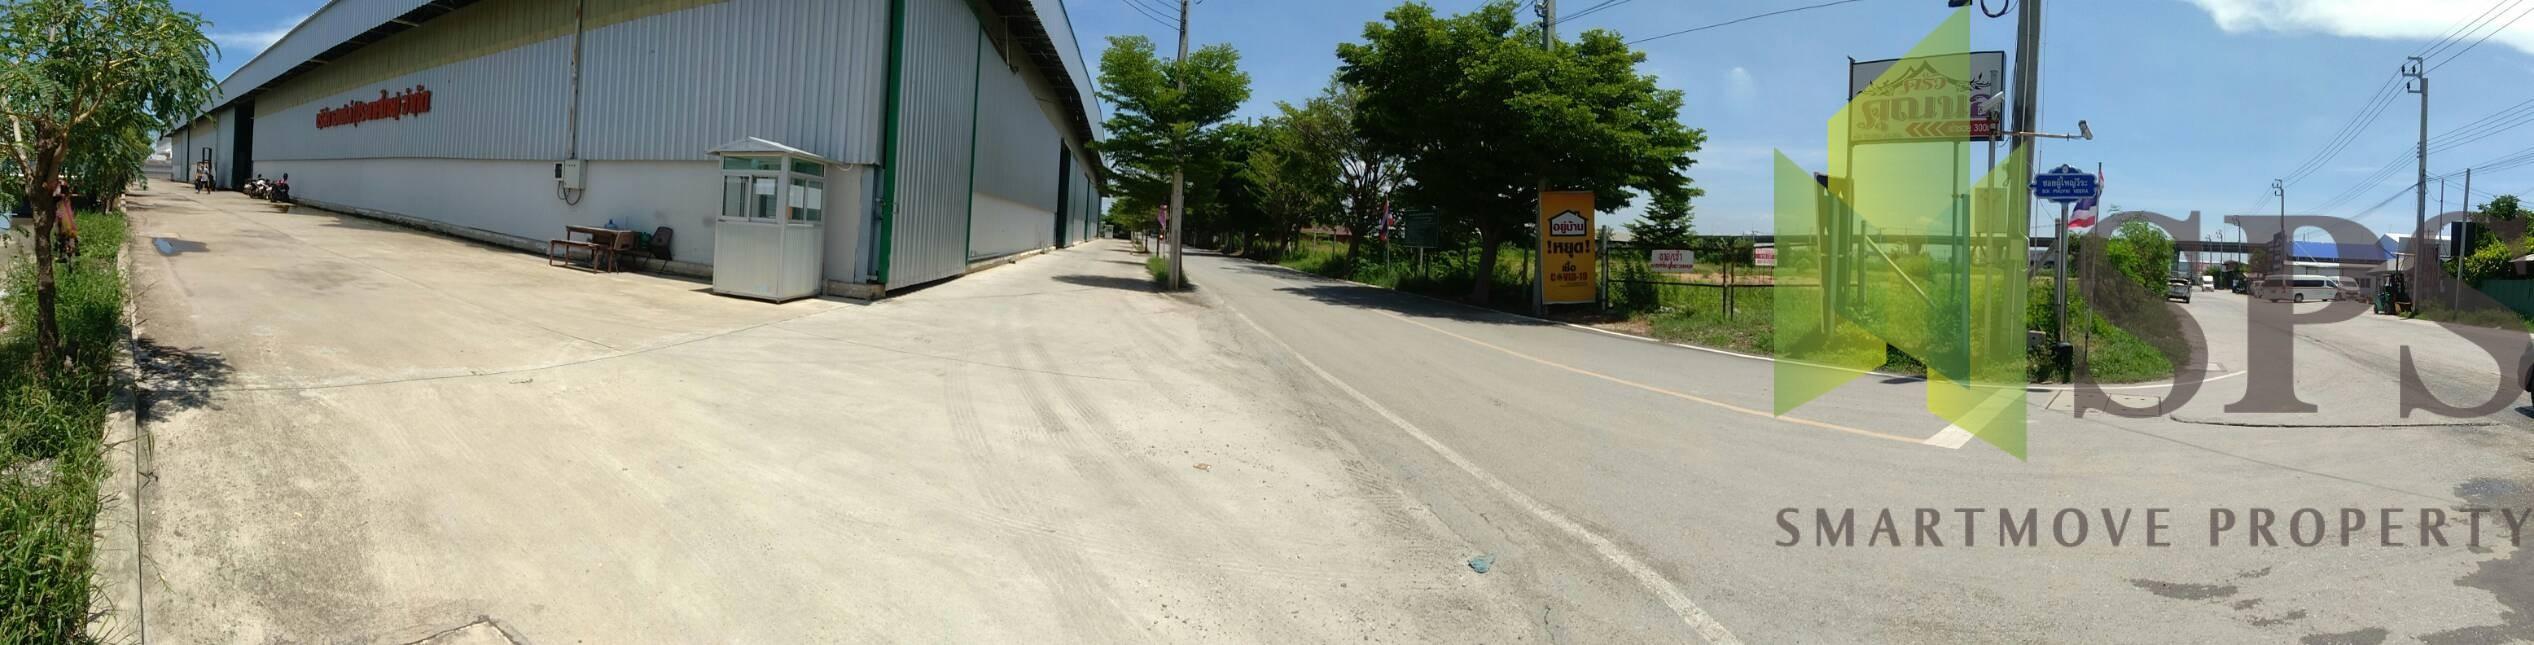 Warehouse for RENT at Bang Bo, Samut Prakan/ โกดัง สำหรับเช่า ที่ บางบ่อ สมุทรปราการ (SPS-GW839)